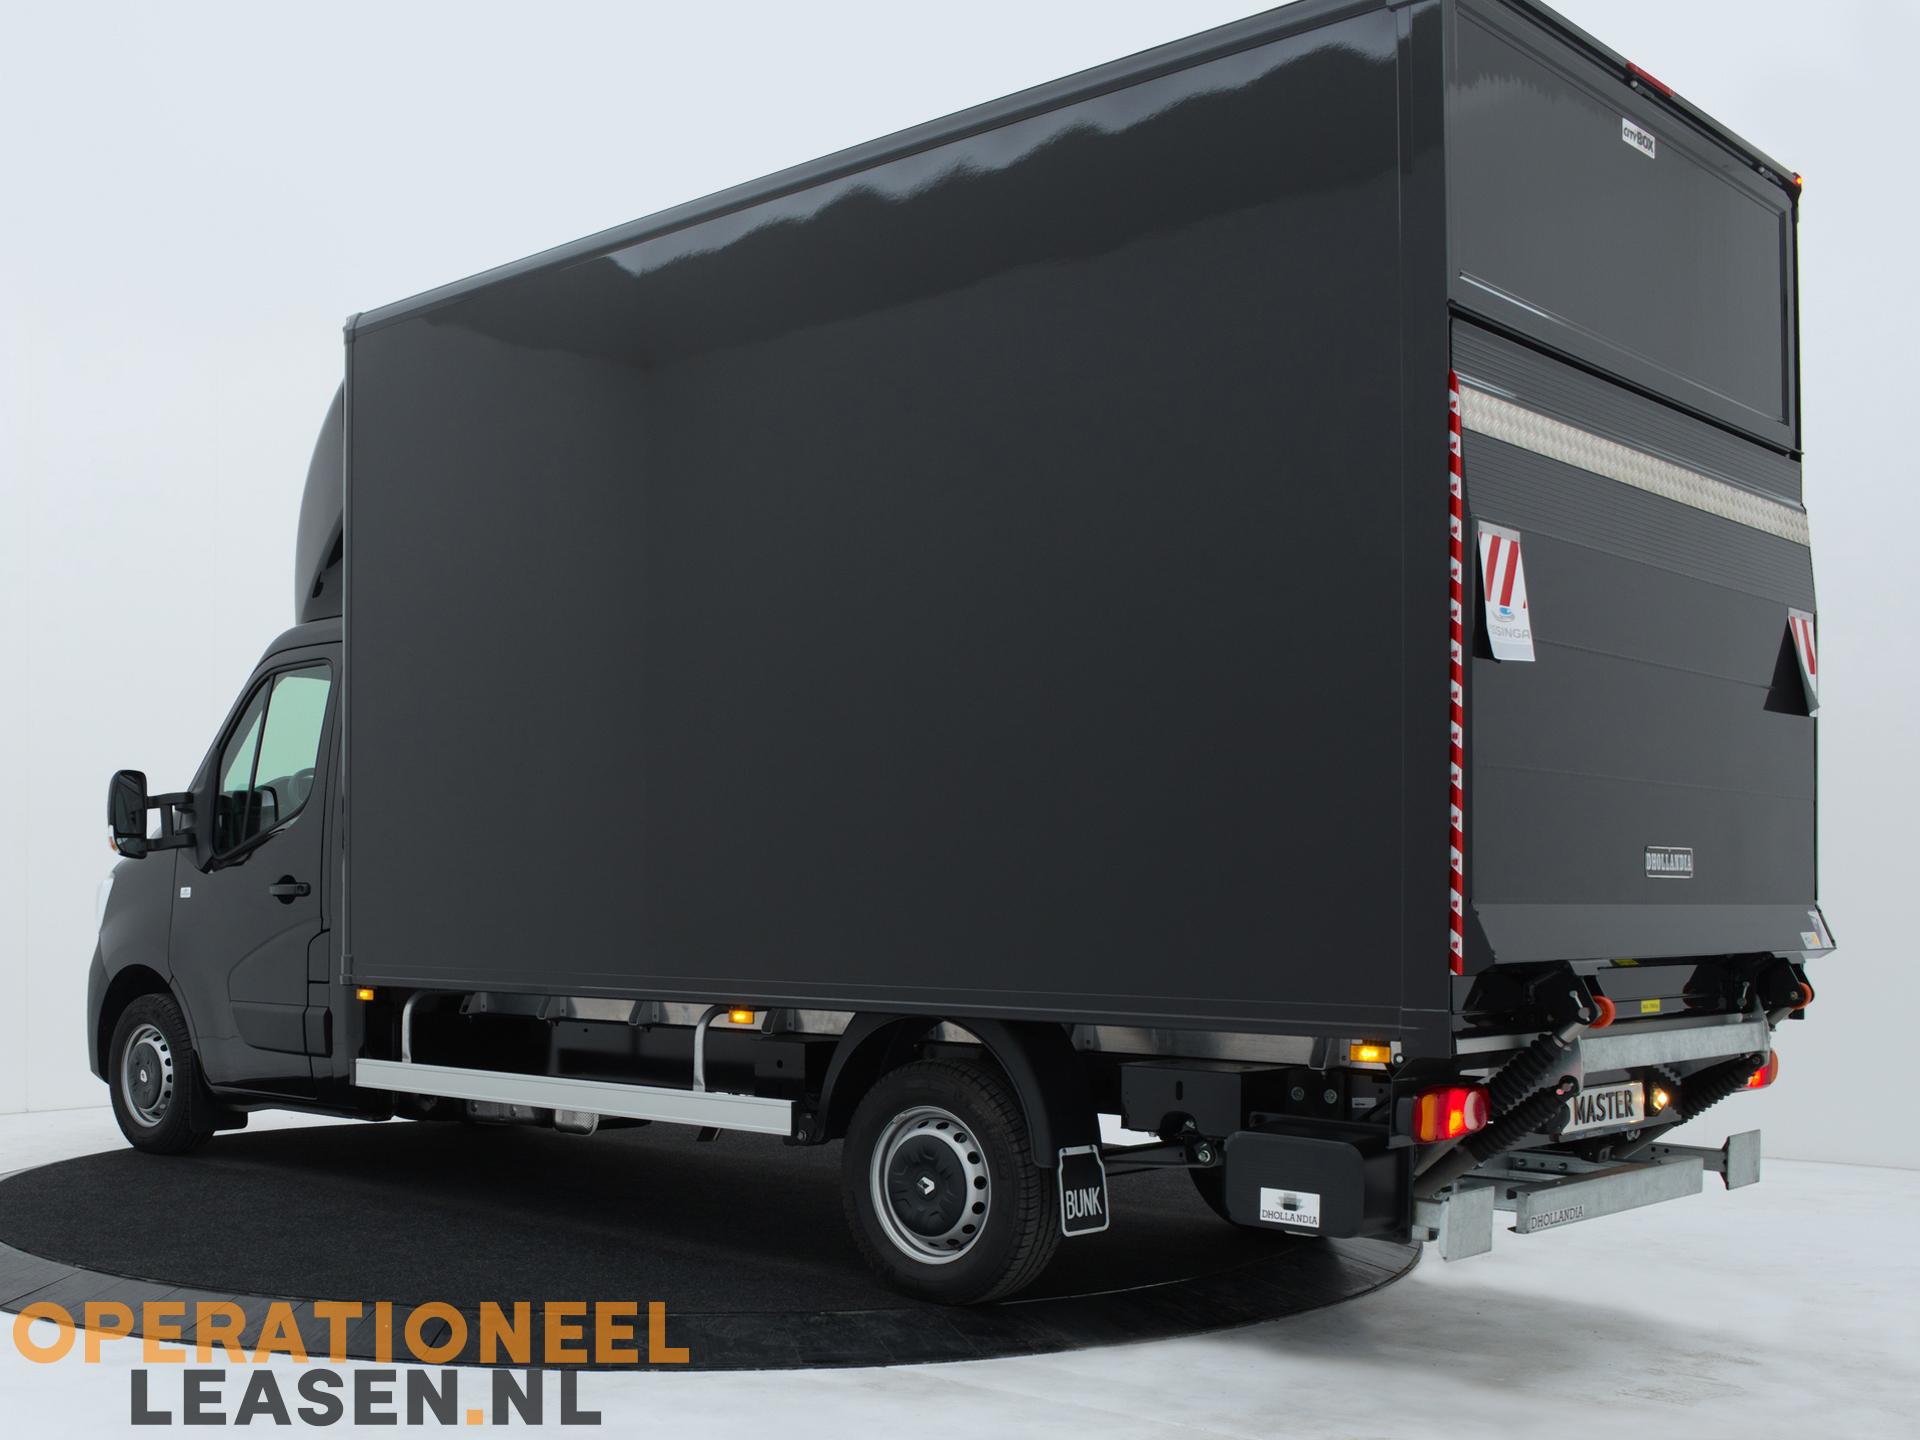 Operational lease zwarte bakwagen-7